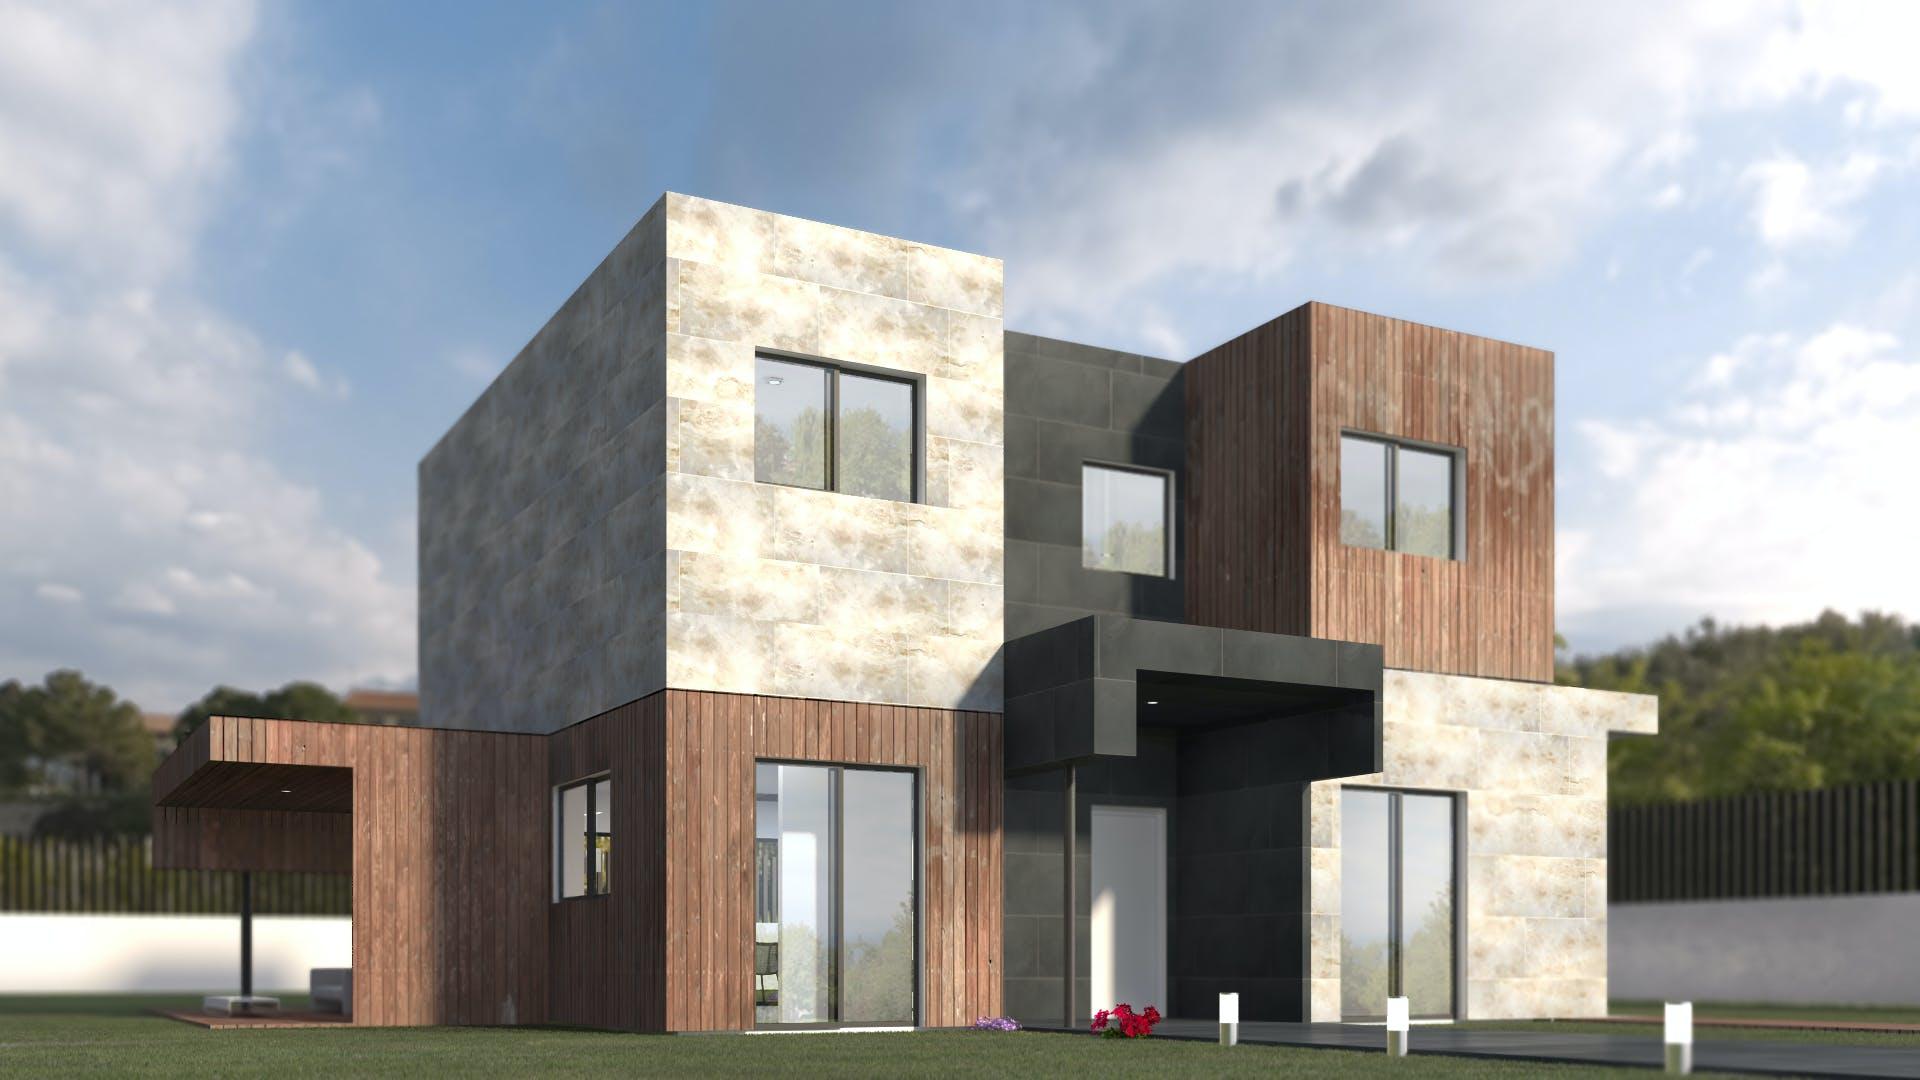 Casas prefabricadas en espa a modelo 4b miguel martinez archinect - Casas prefabricadas espana ...